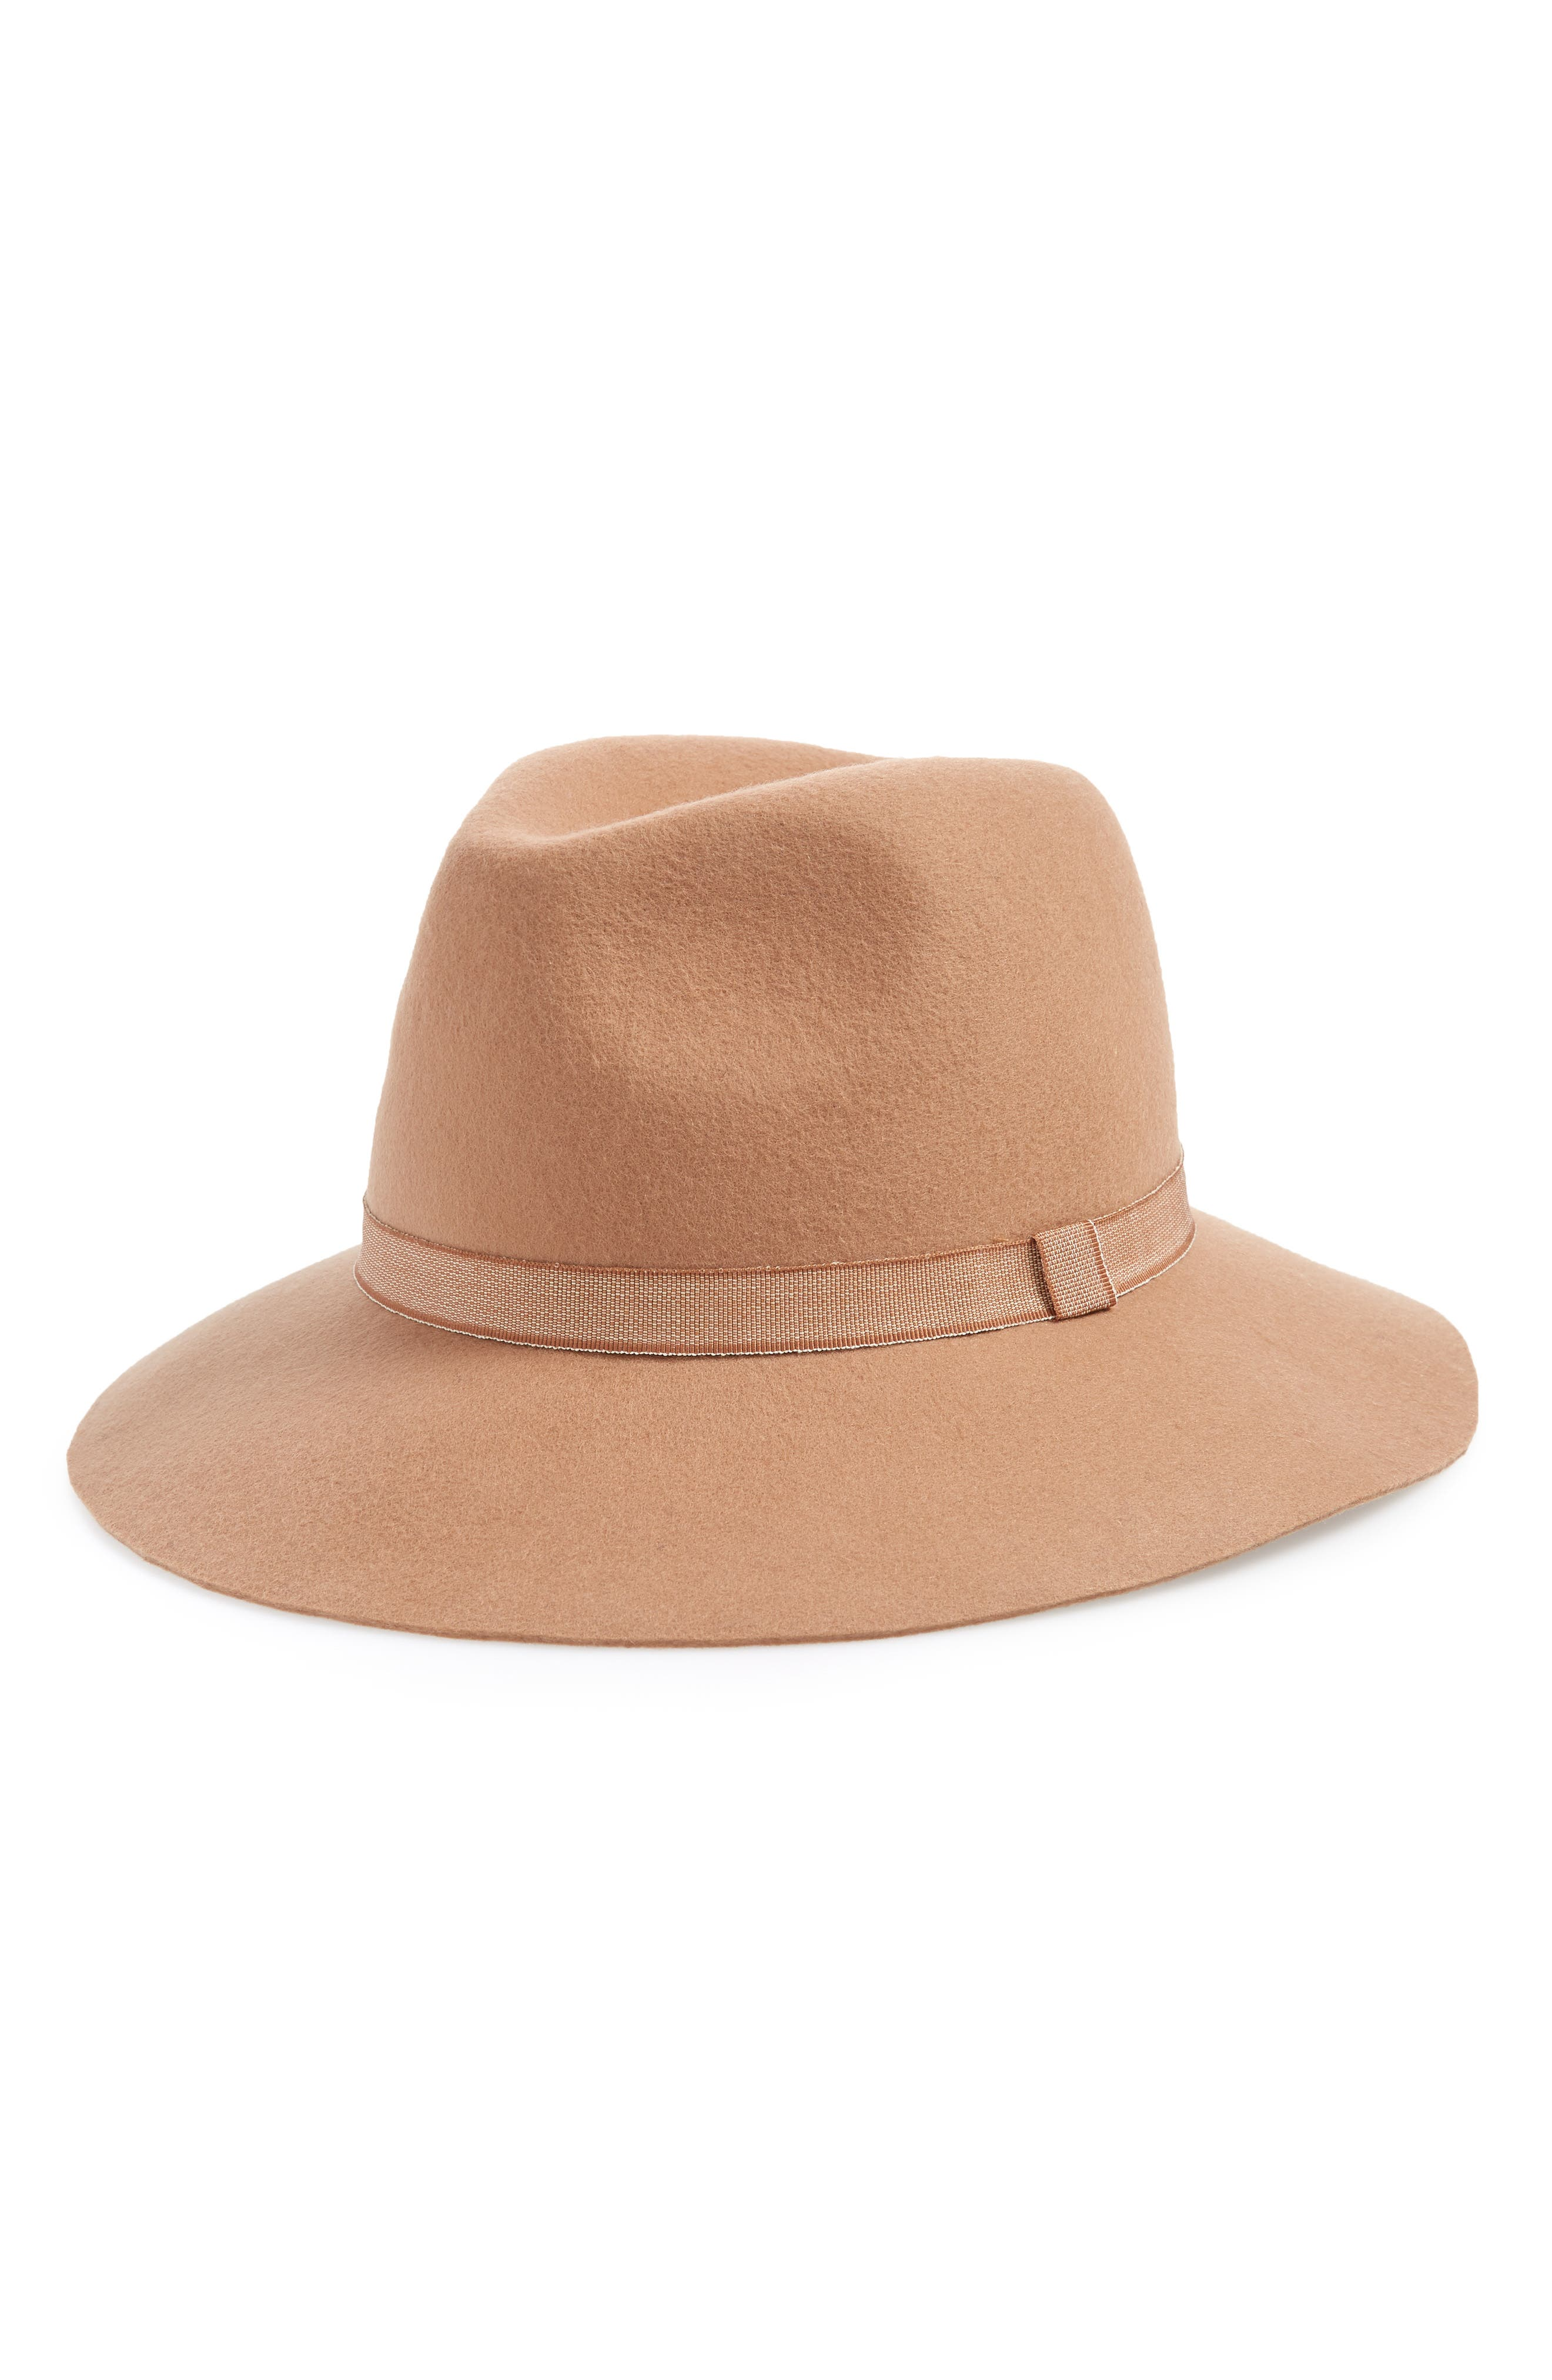 Felt Panama Hat,                             Main thumbnail 1, color,                             CAMEL